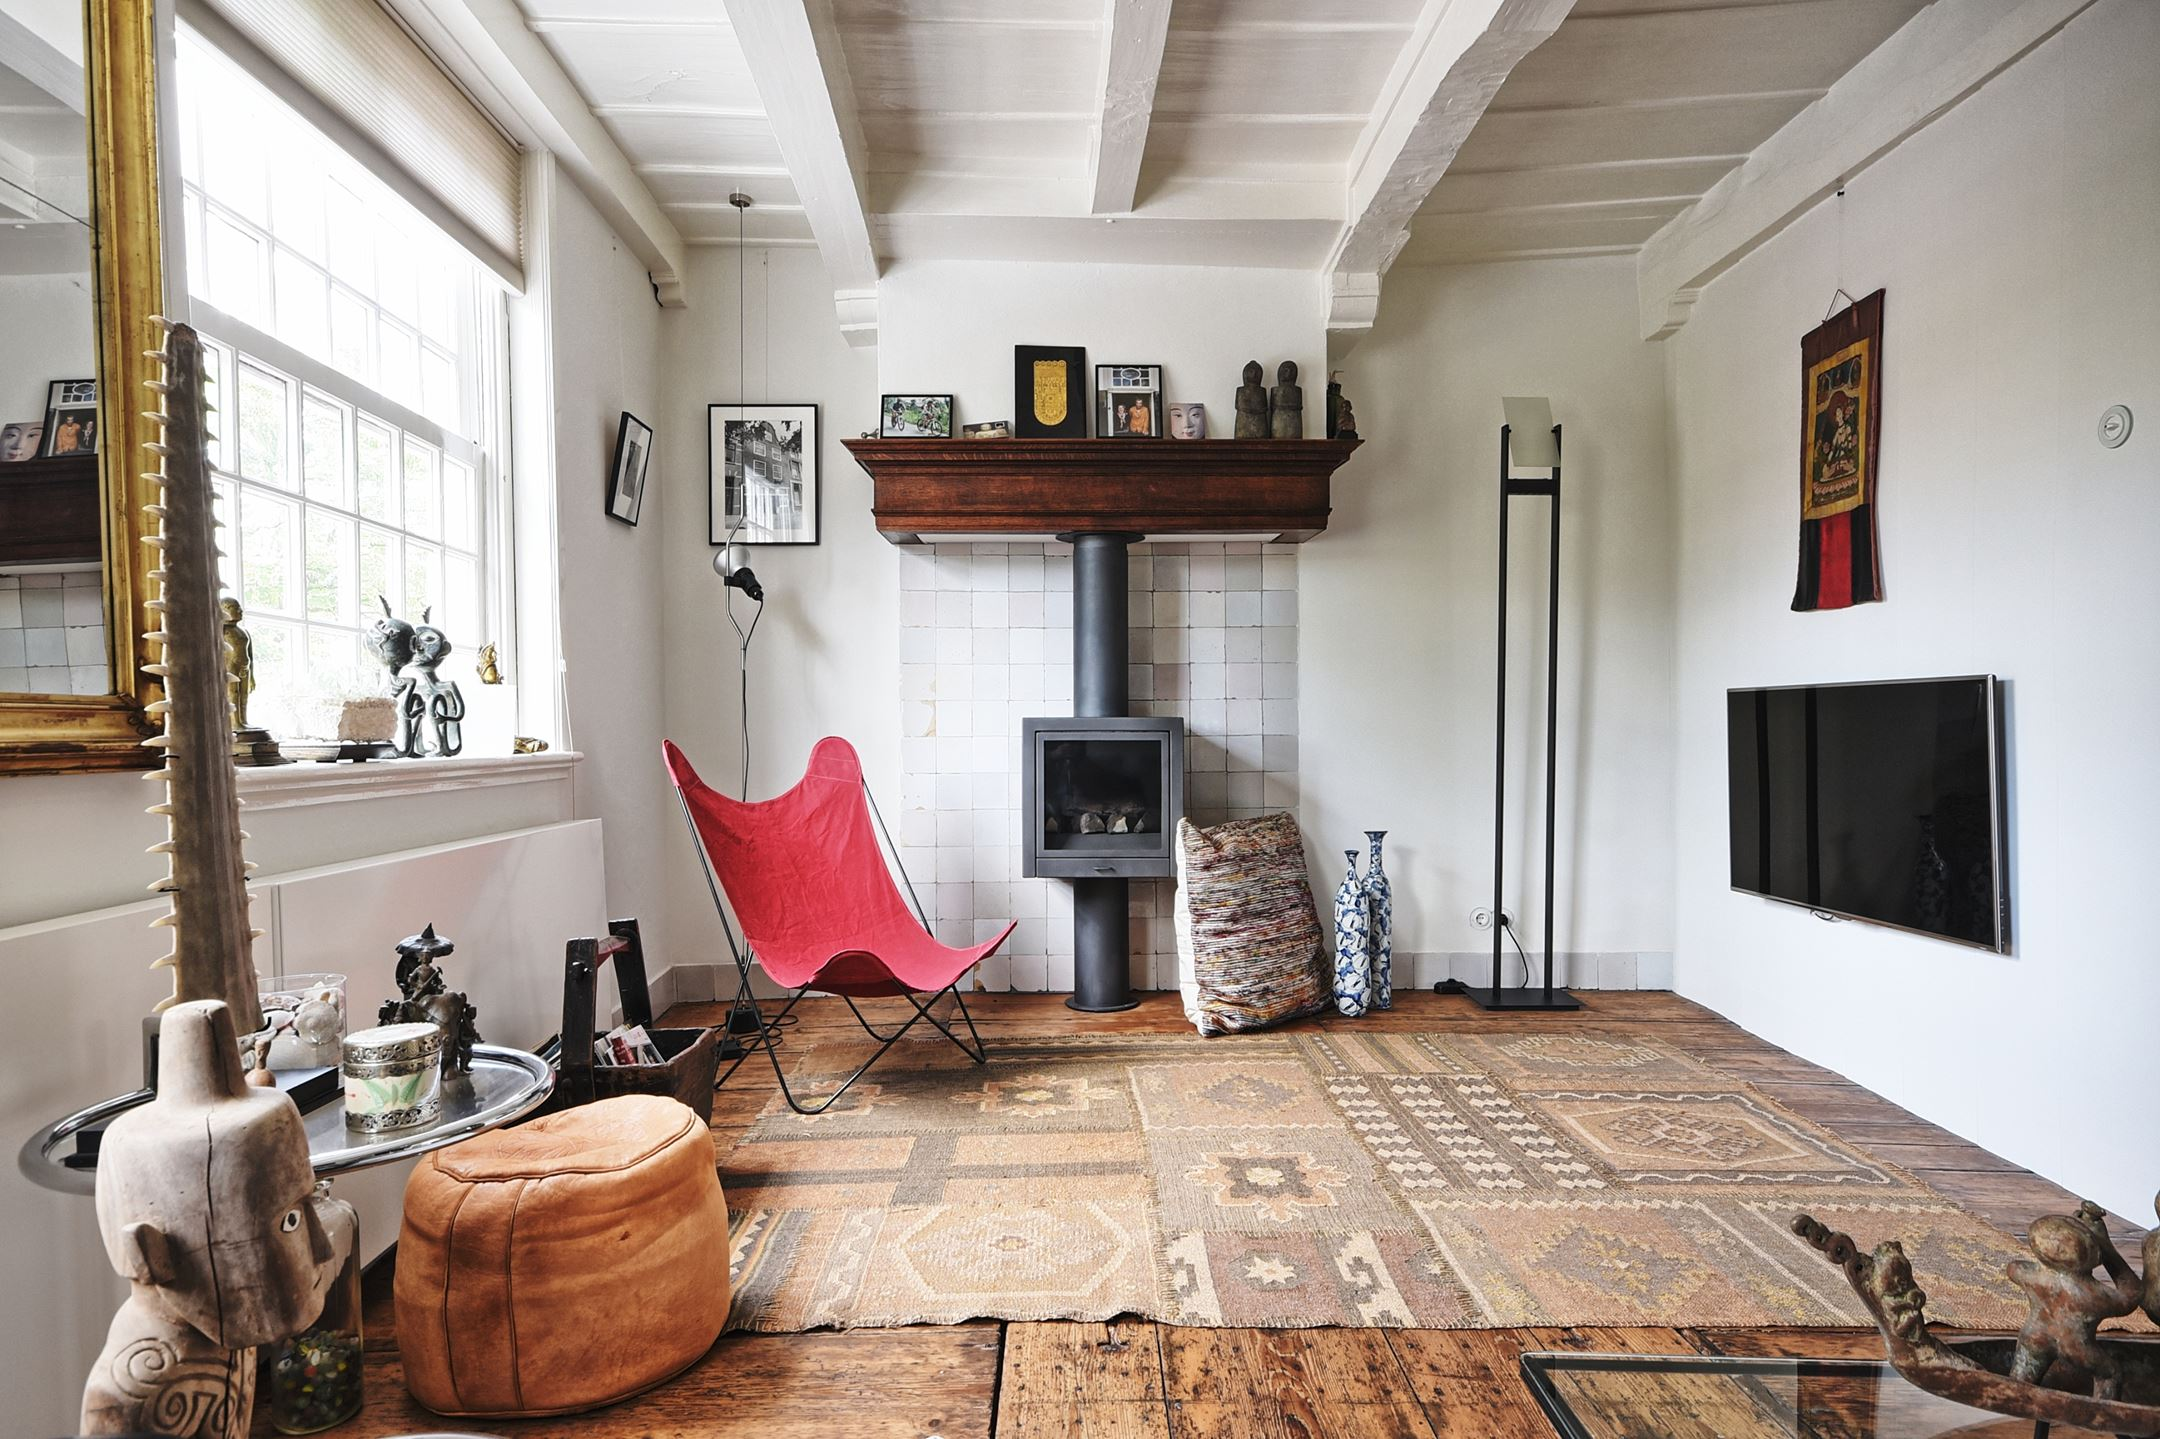 потолок балки камин деревянный пол ковер килим телевизор